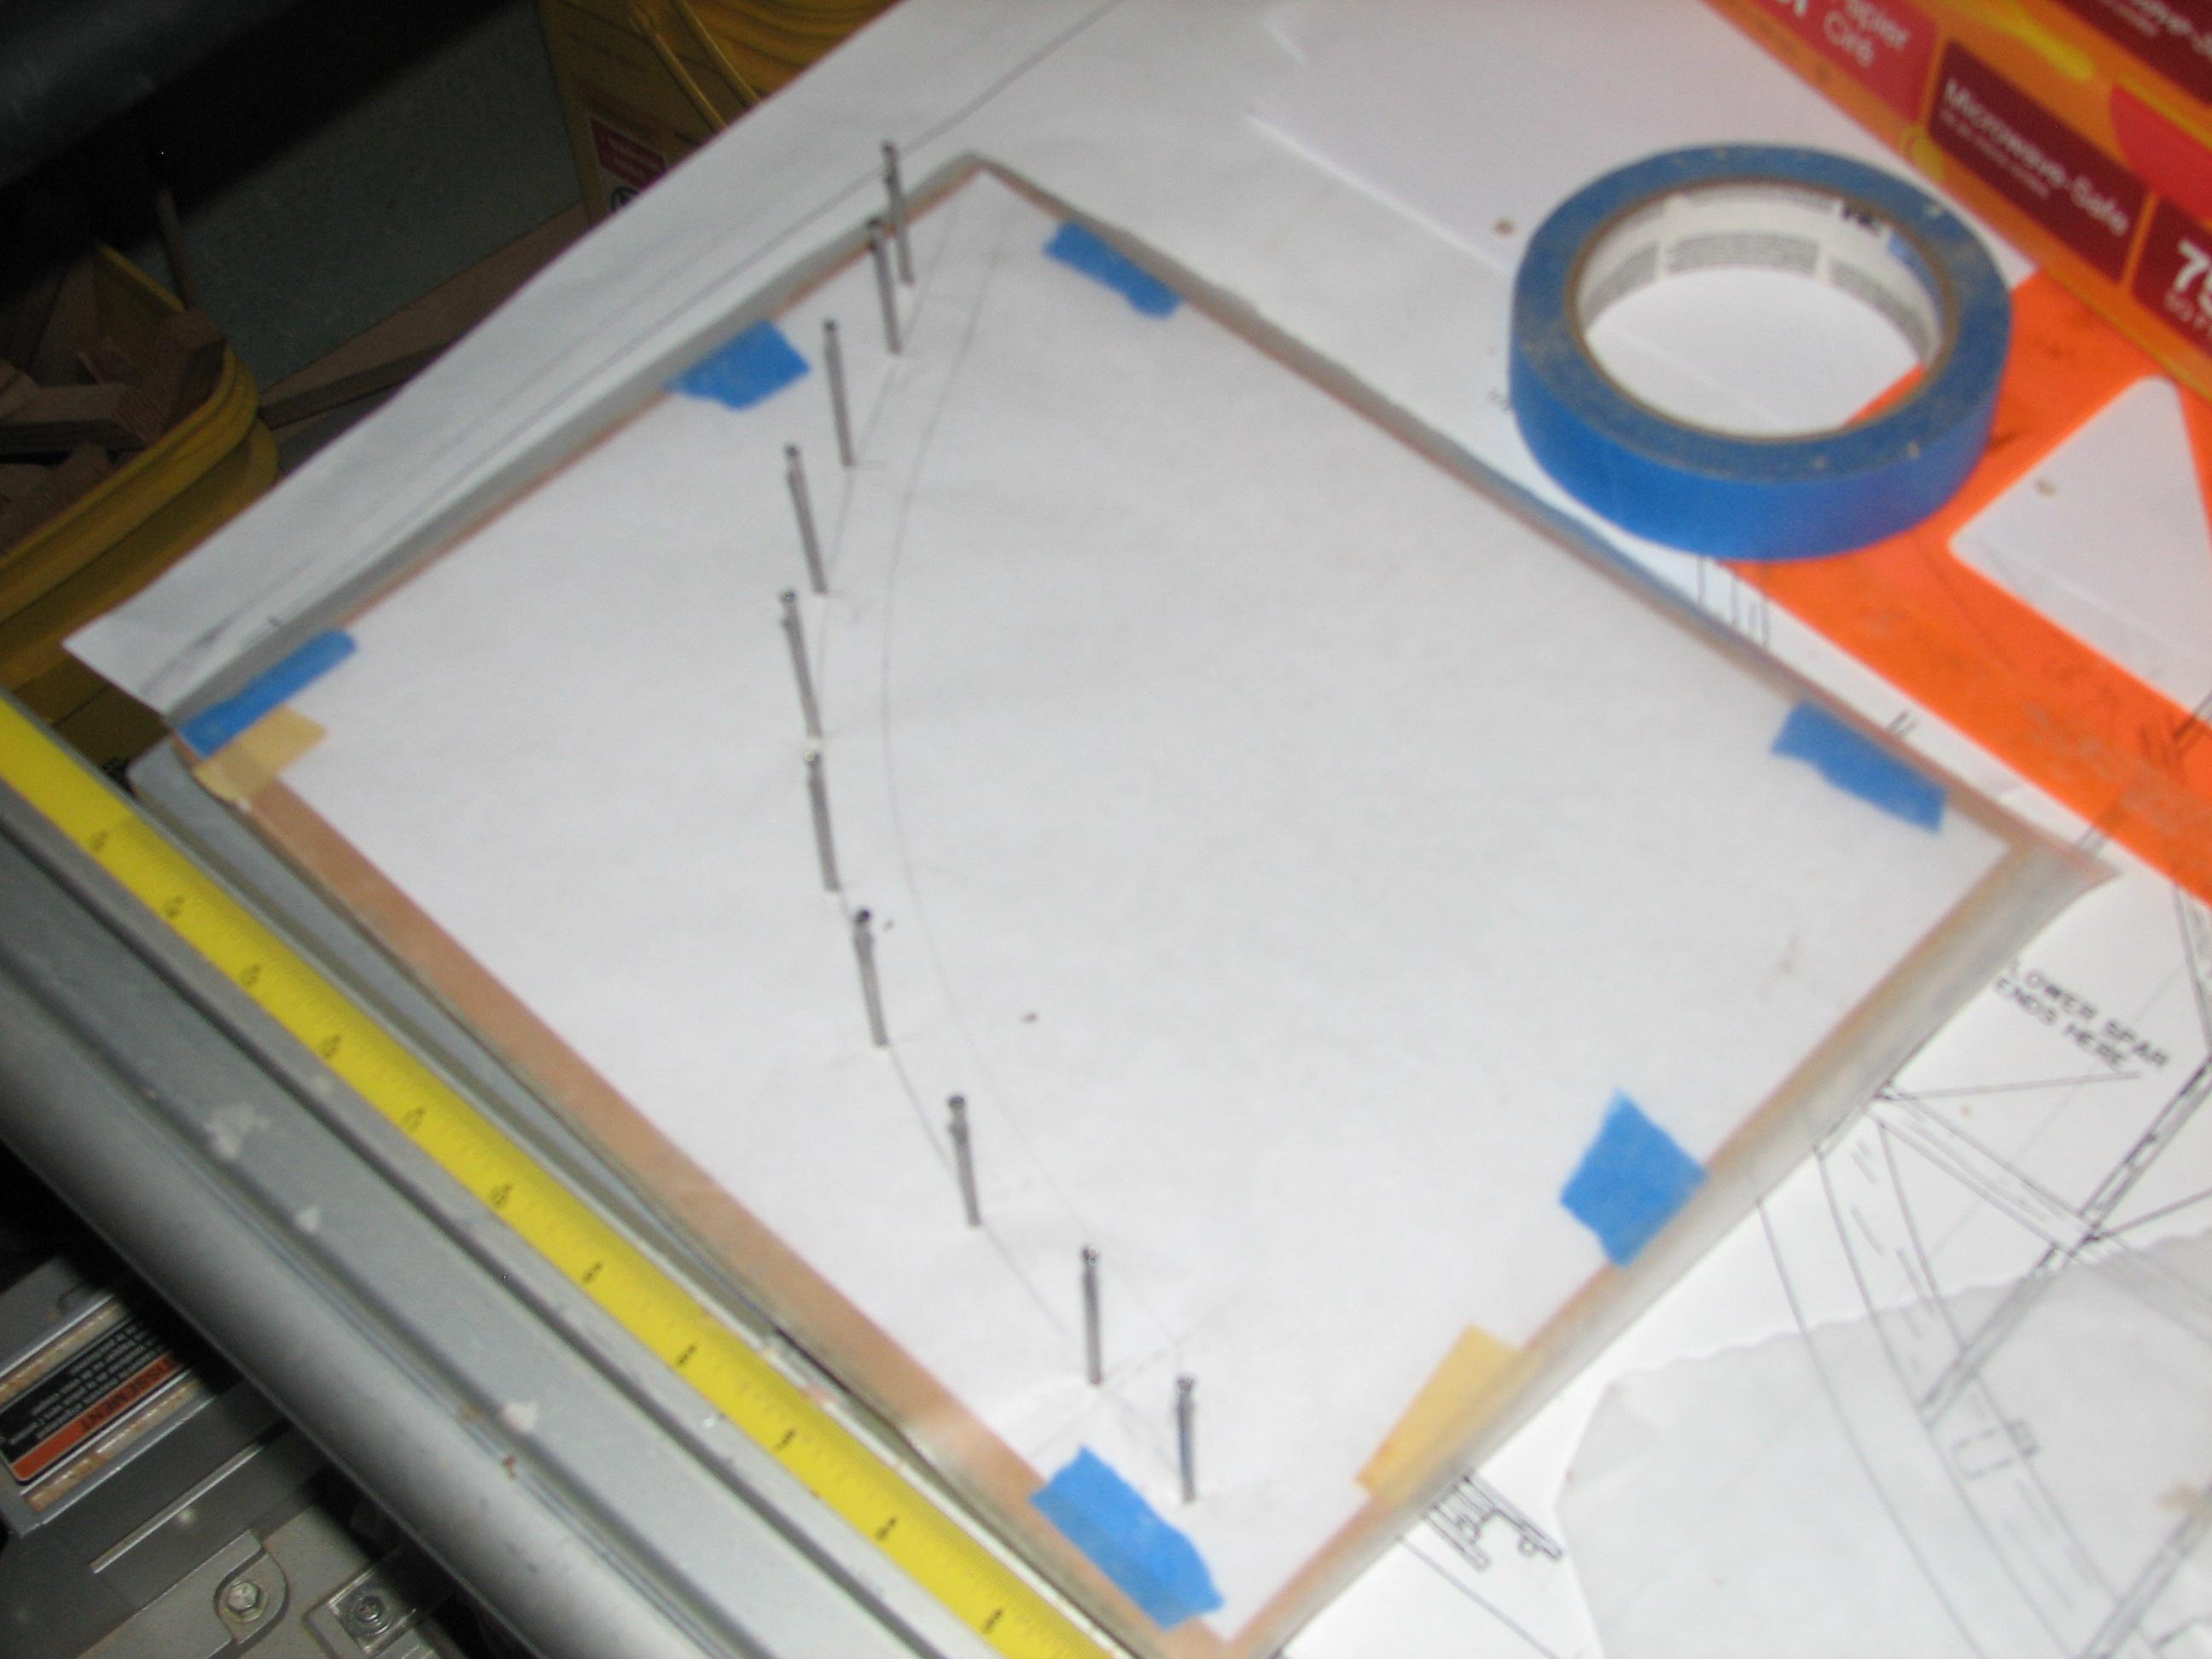 Click image for larger version  Name:Wingtip Balsa USA Nail Form.jpg Views:633 Size:874.0 KB ID:2196012